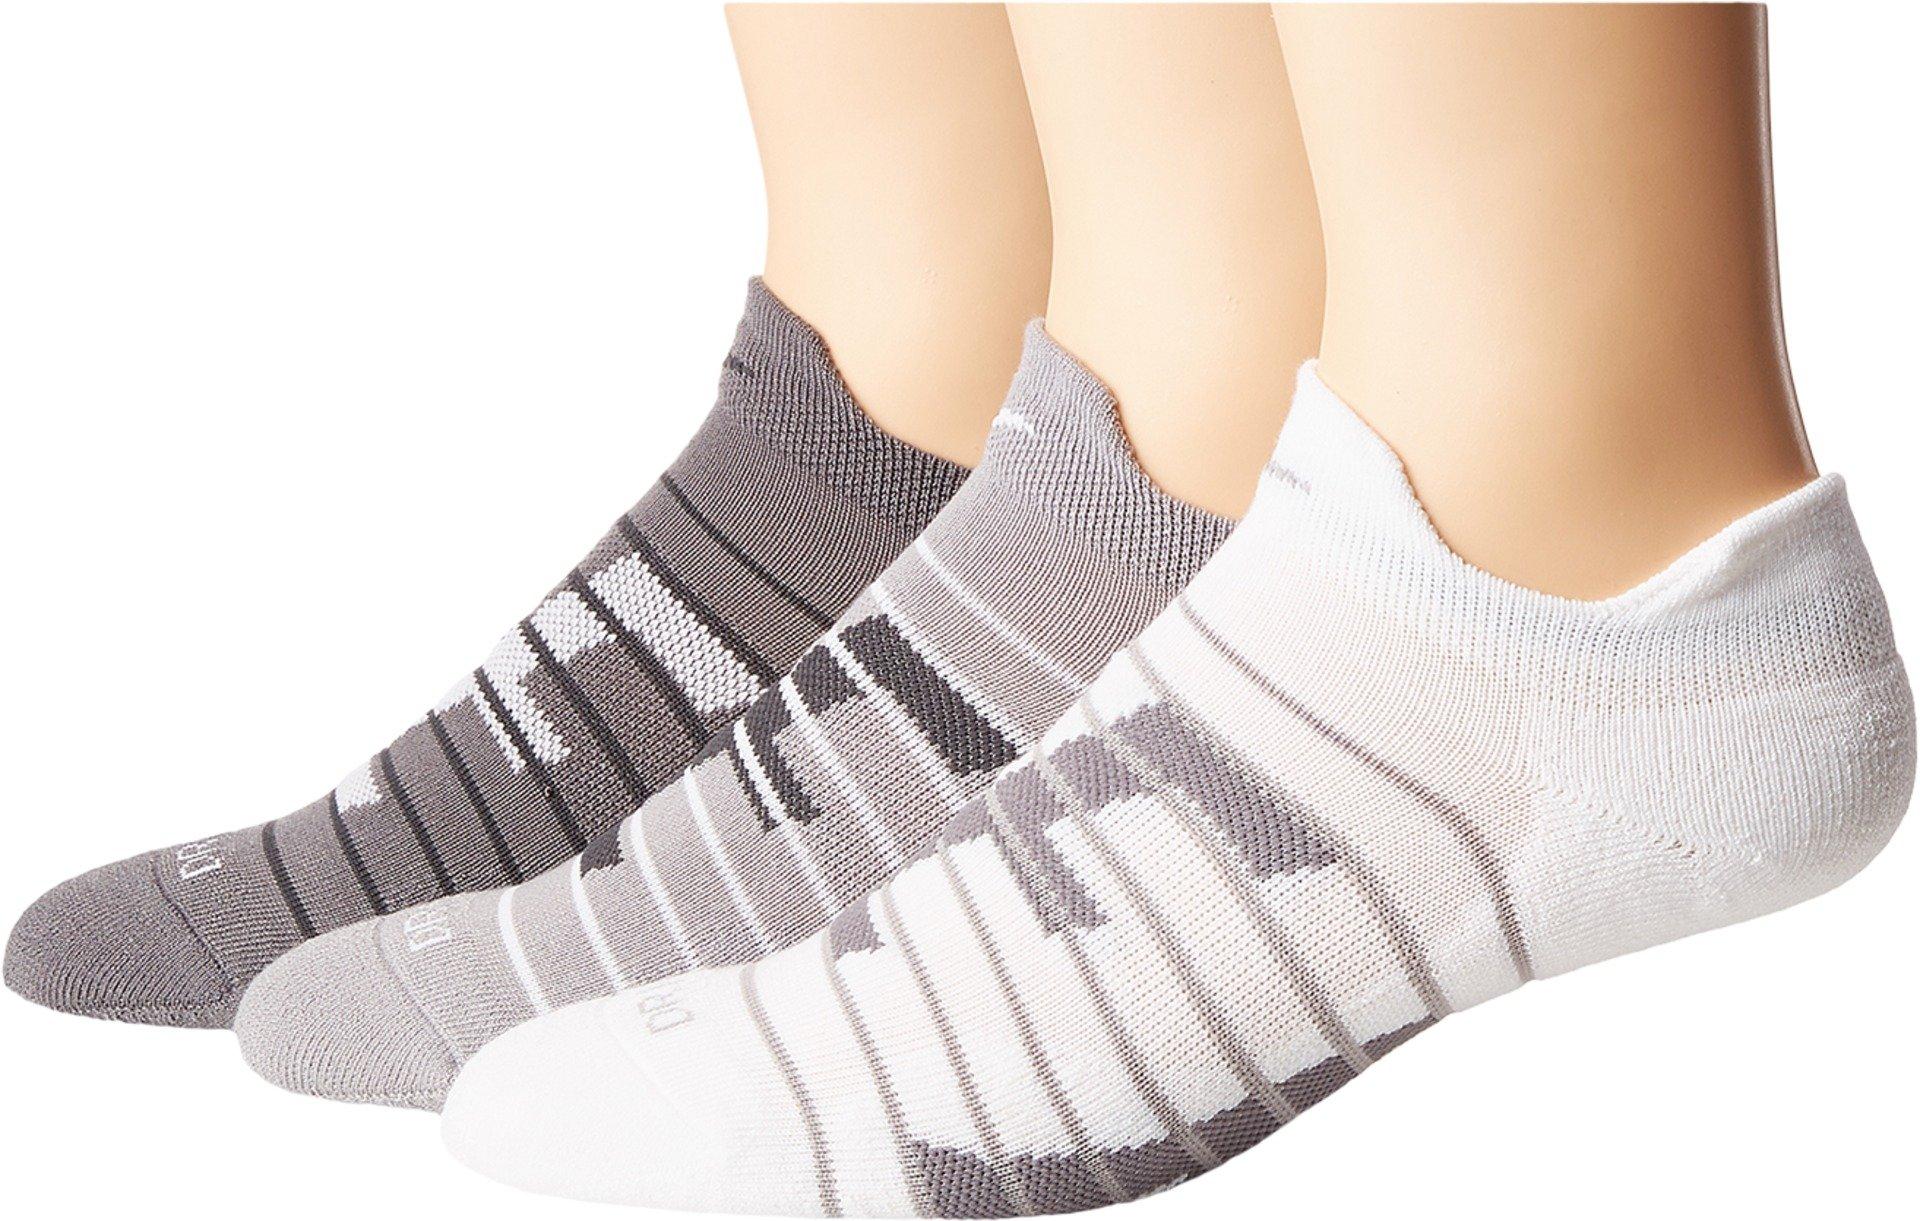 Nike Women`s Dry Cushion Low Training Socks (3 Pair), Nike Stripe Logo (Sx6879-925) / Assorted , Medium  by Nike